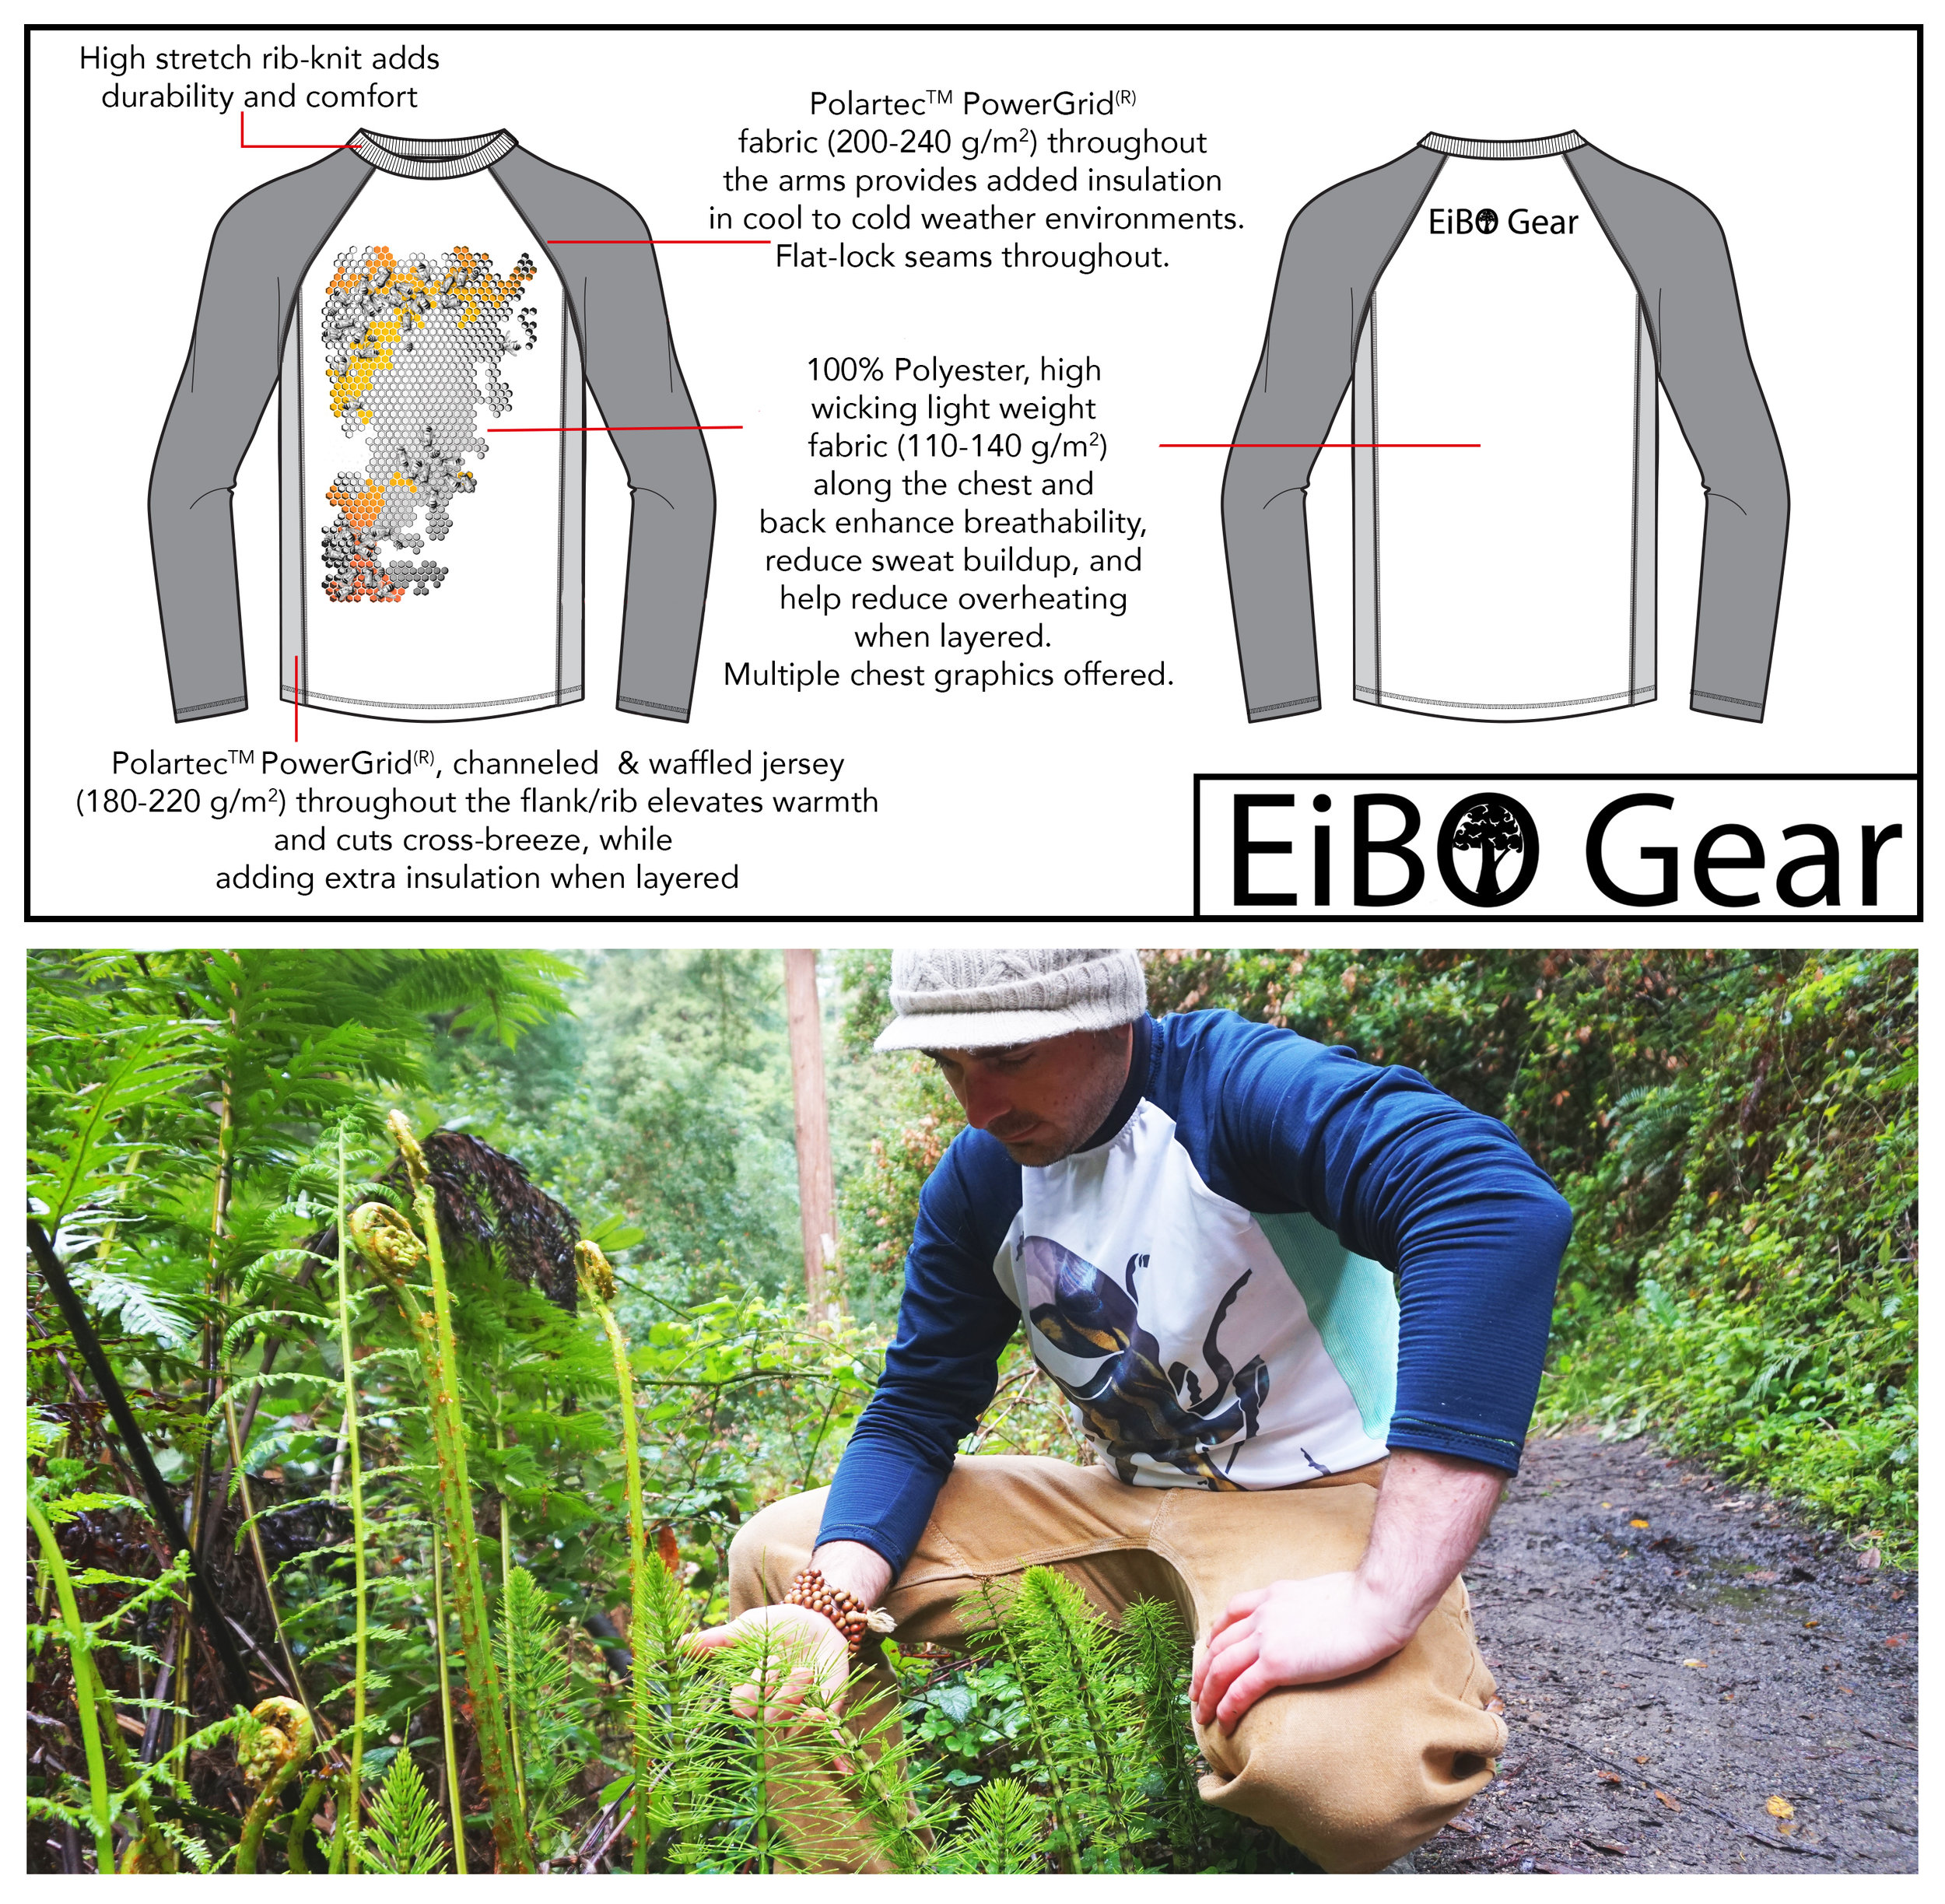 EiBO Cover Image.jpg